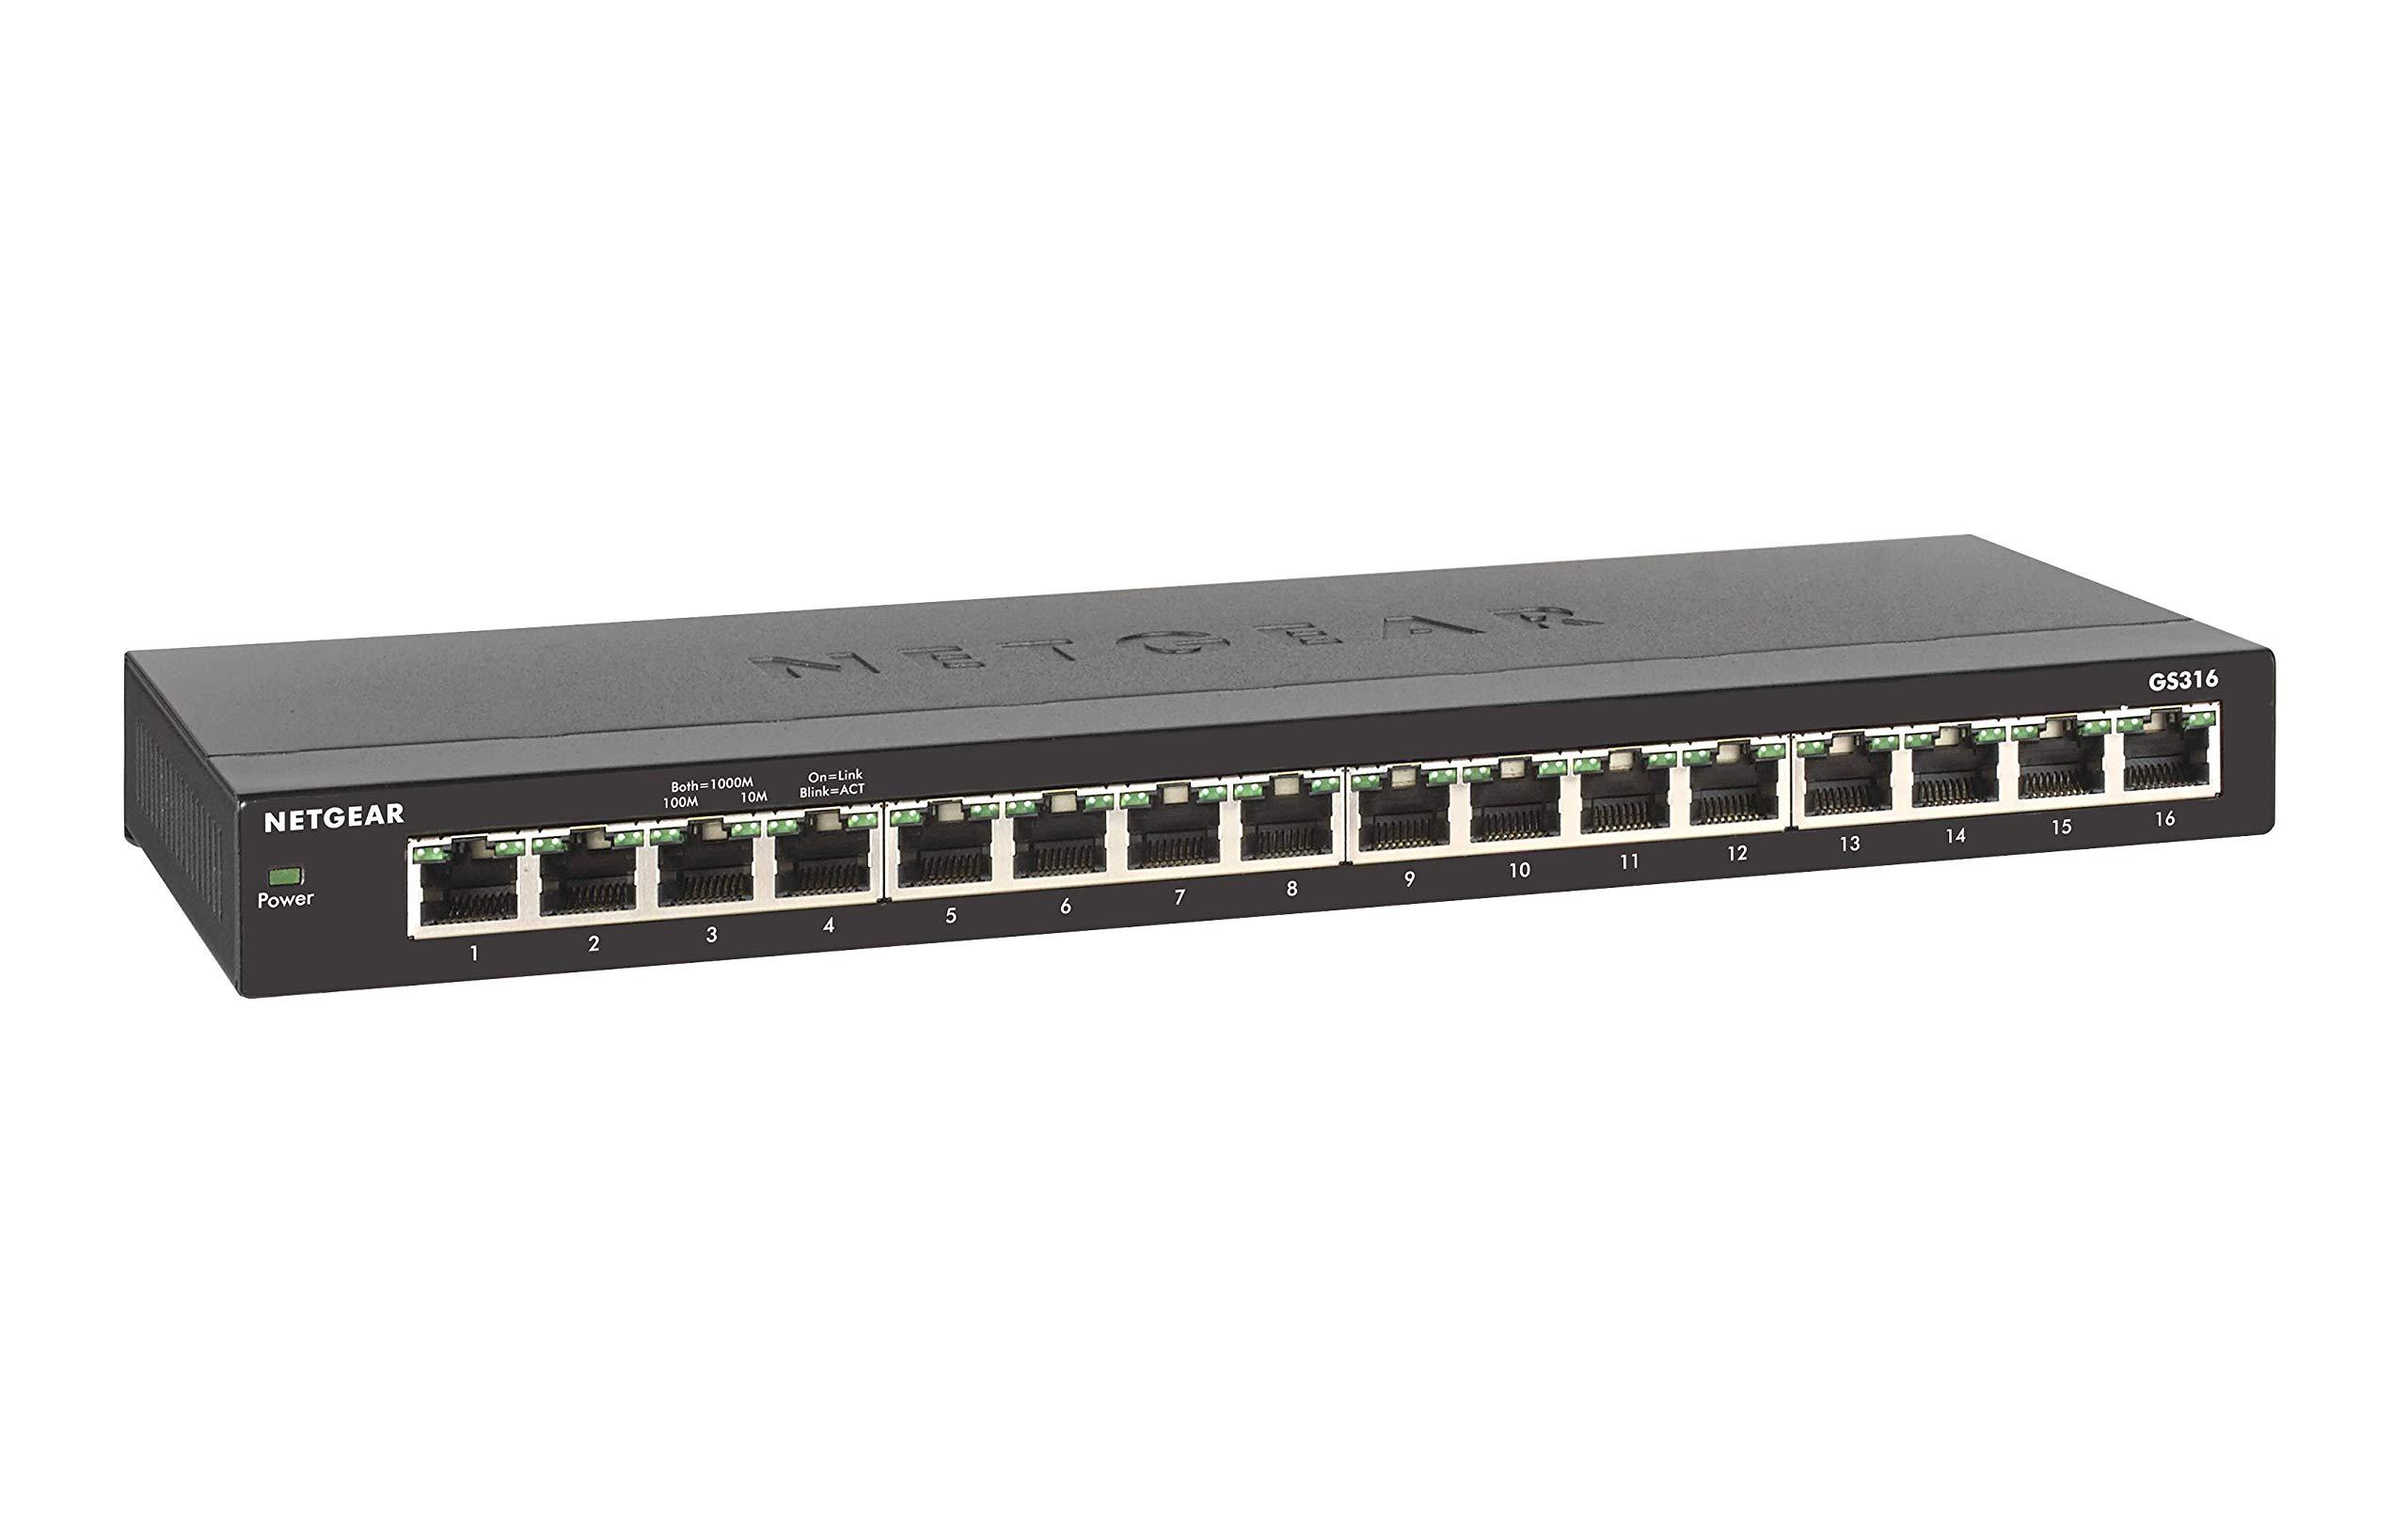 NETGEAR 16-Port Gigabit Ethernet Unmanaged Switch (GS316) - Desktop, Fanless Housing for Quiet Operation by NETGEAR